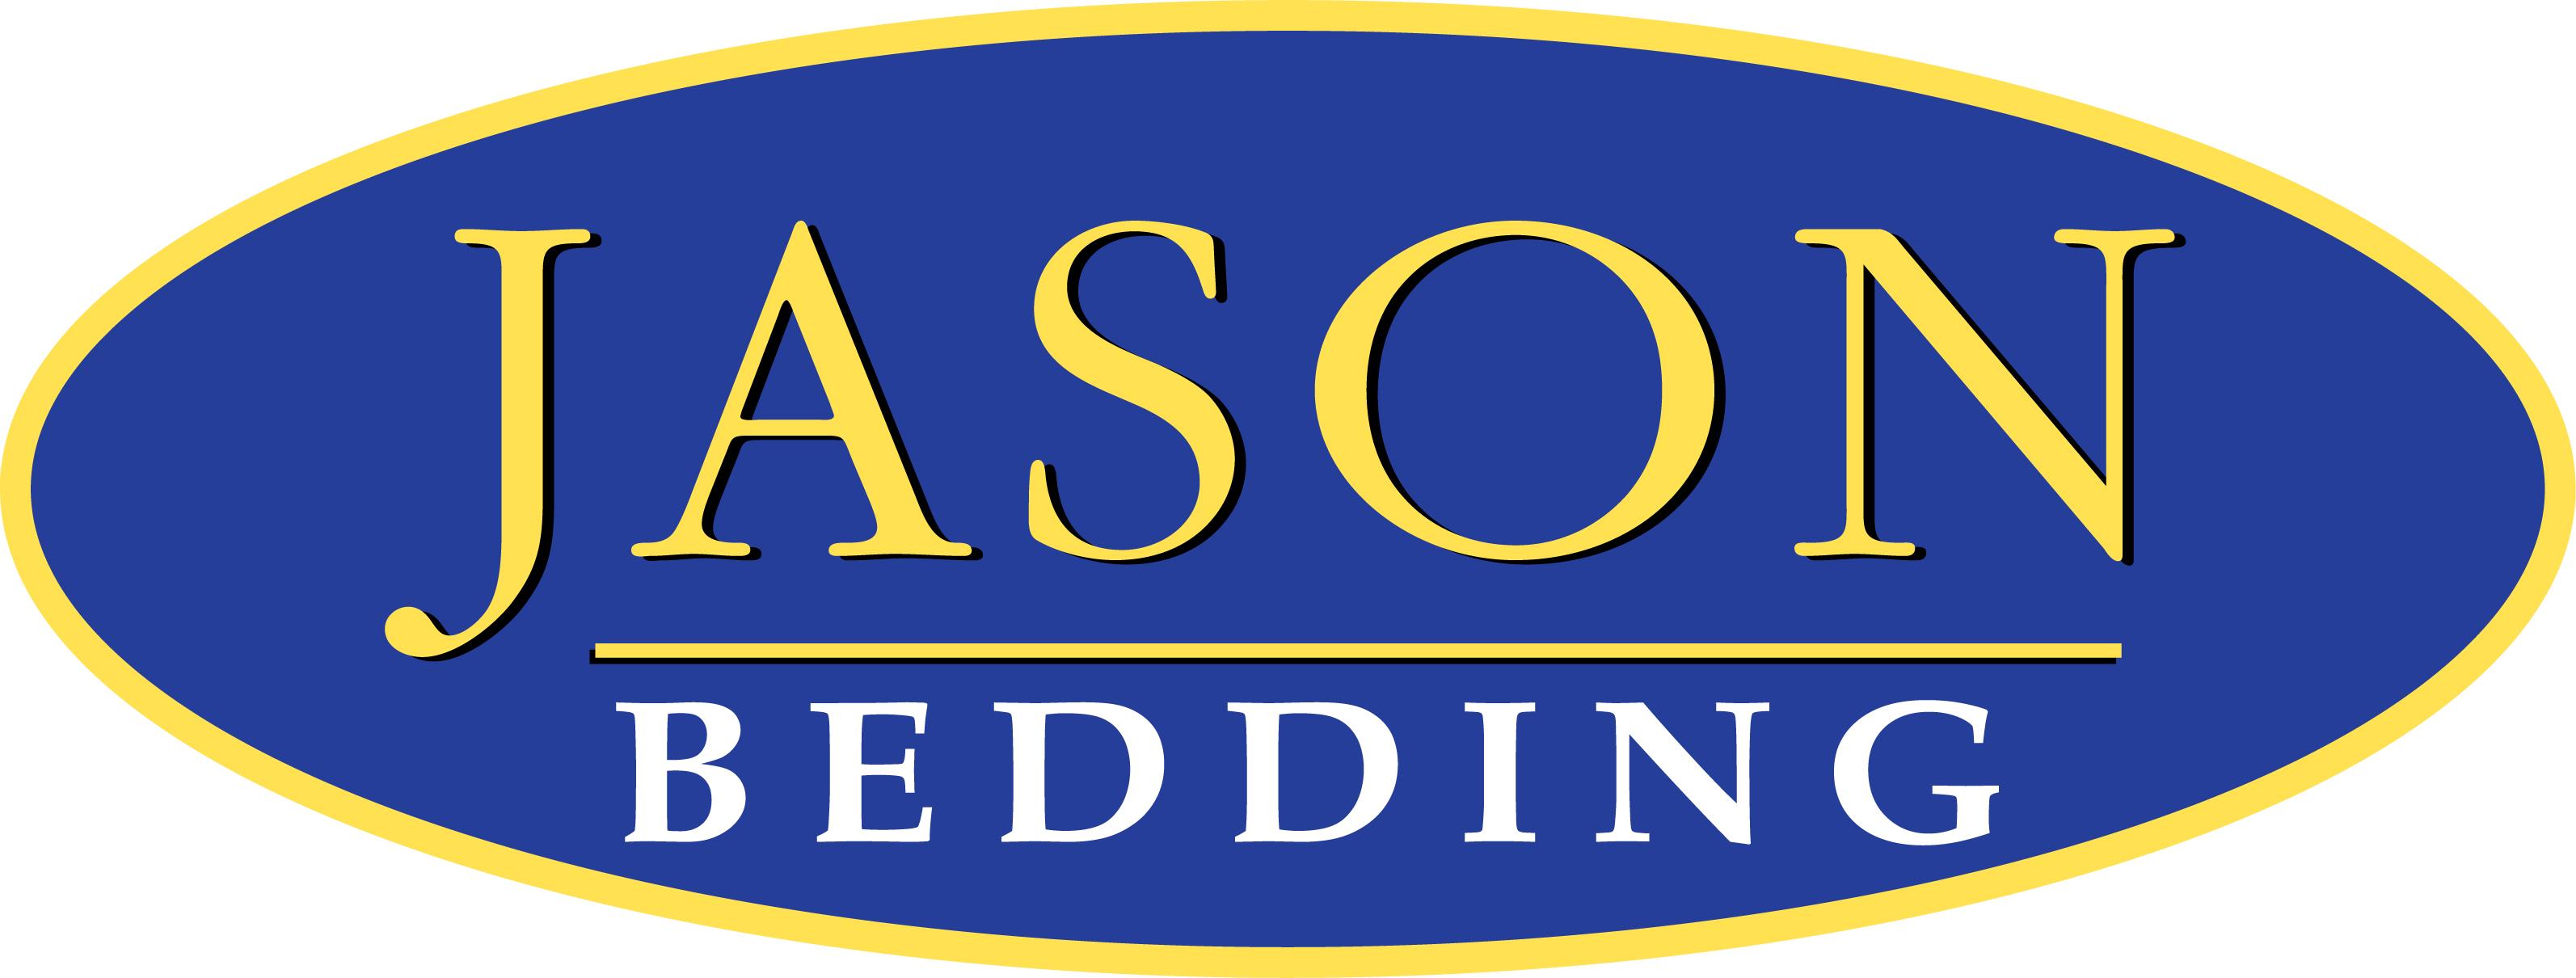 Jasson Logo